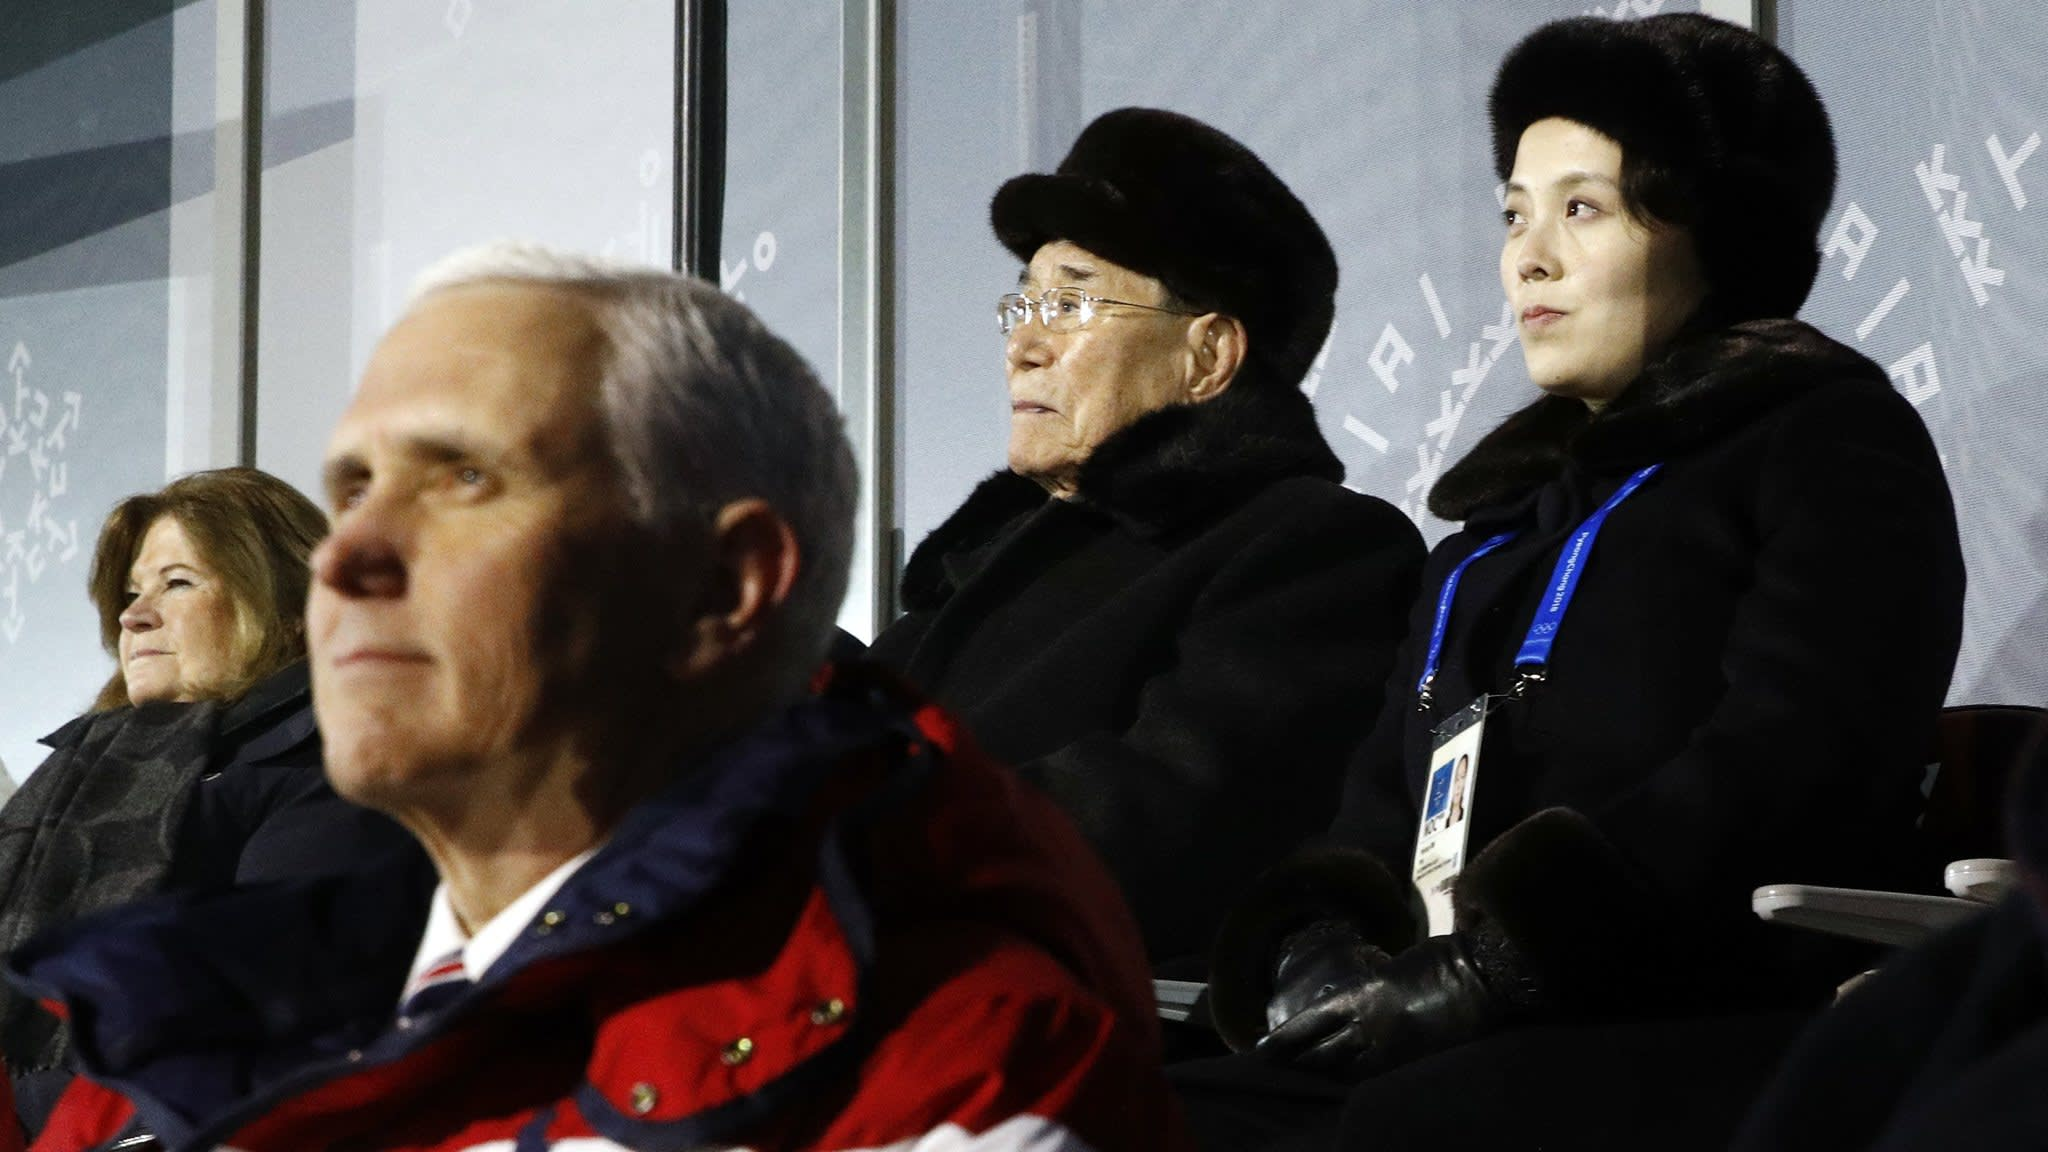 North Korea axed US meeting after tough Pence rhetoric